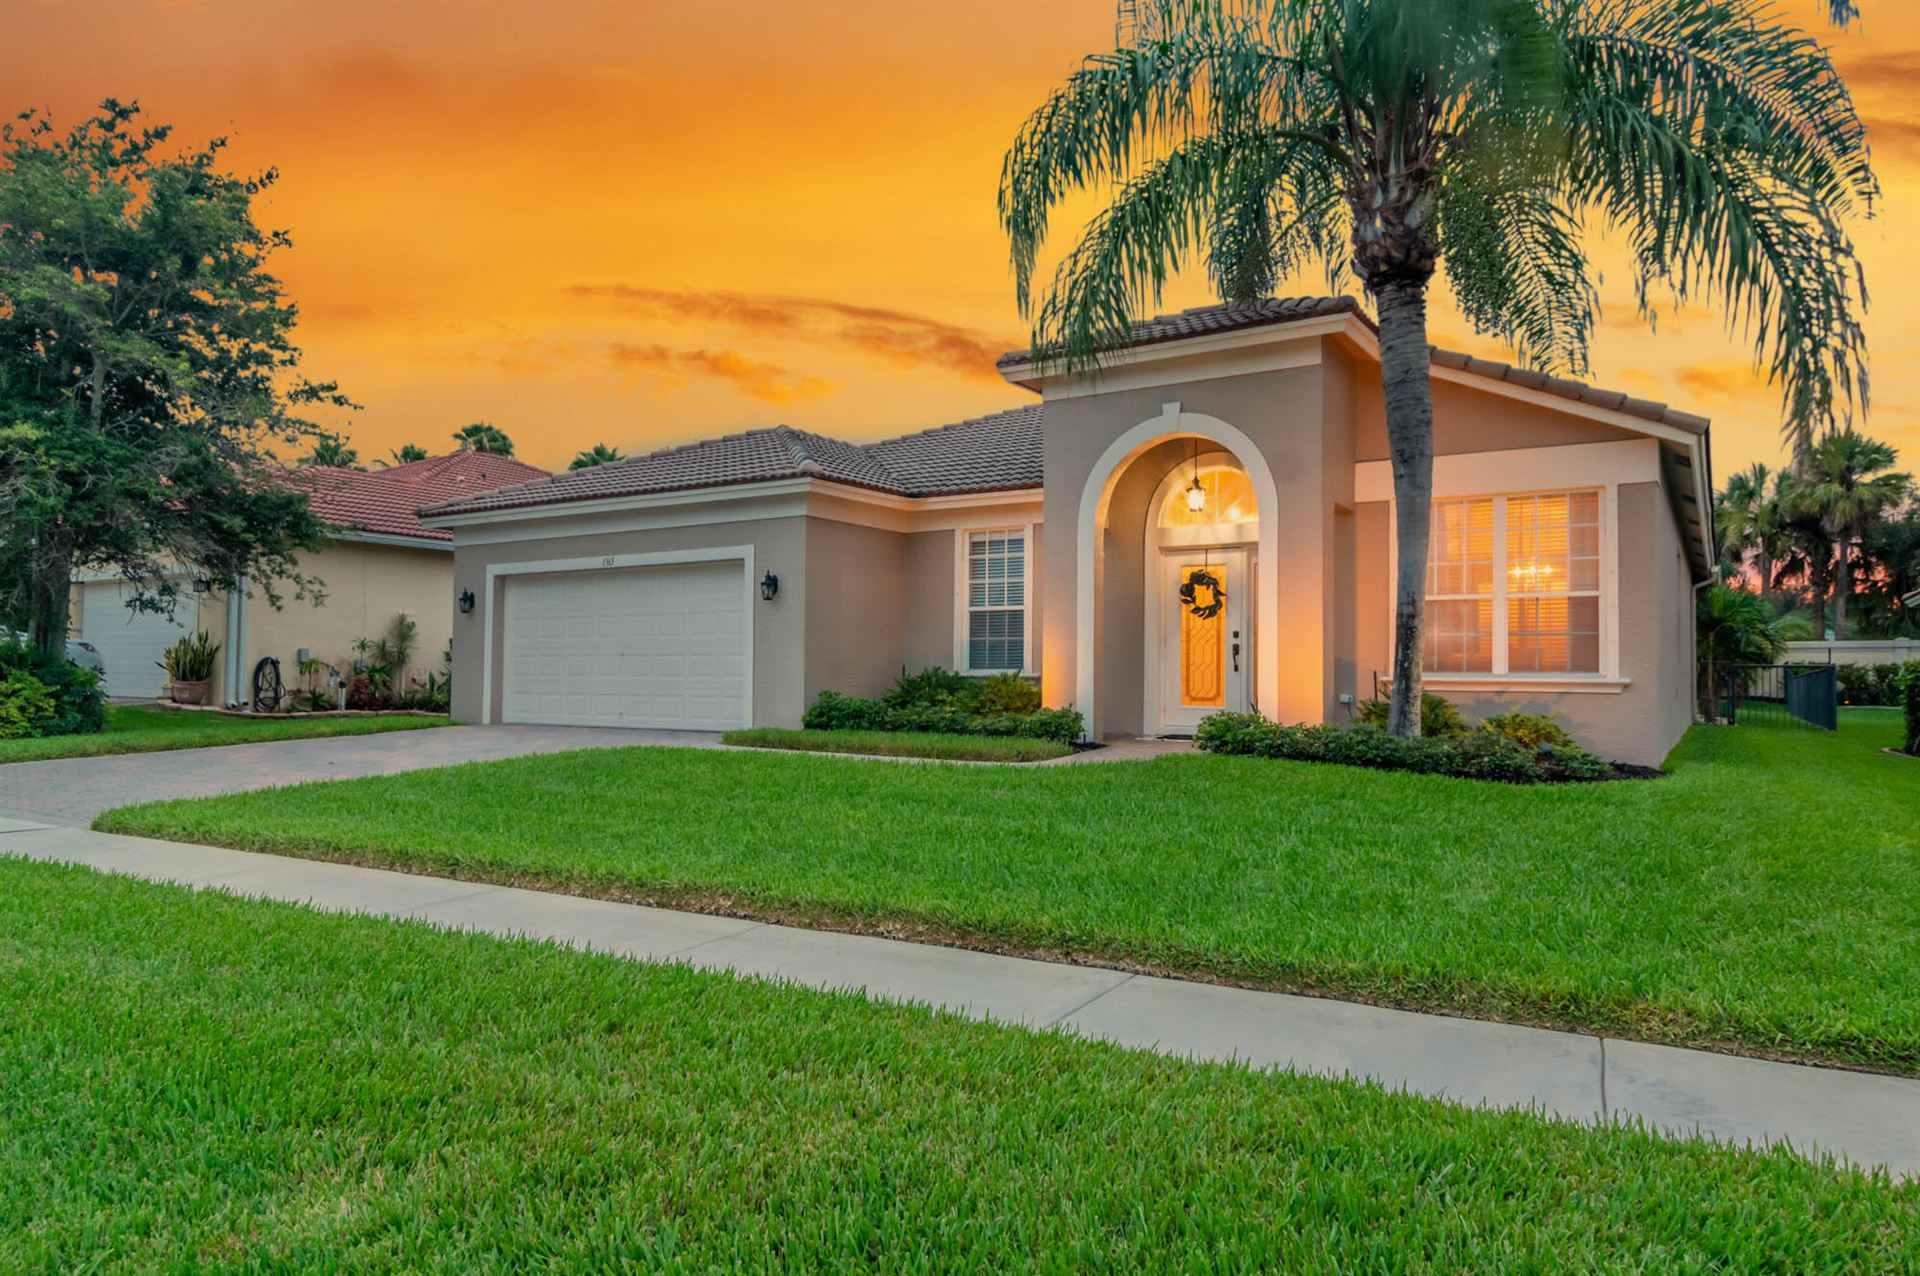 Photo of 1365 Stonehaven Estates Drive, West Palm Beach, FL 33411 (MLS # RX-10736225)